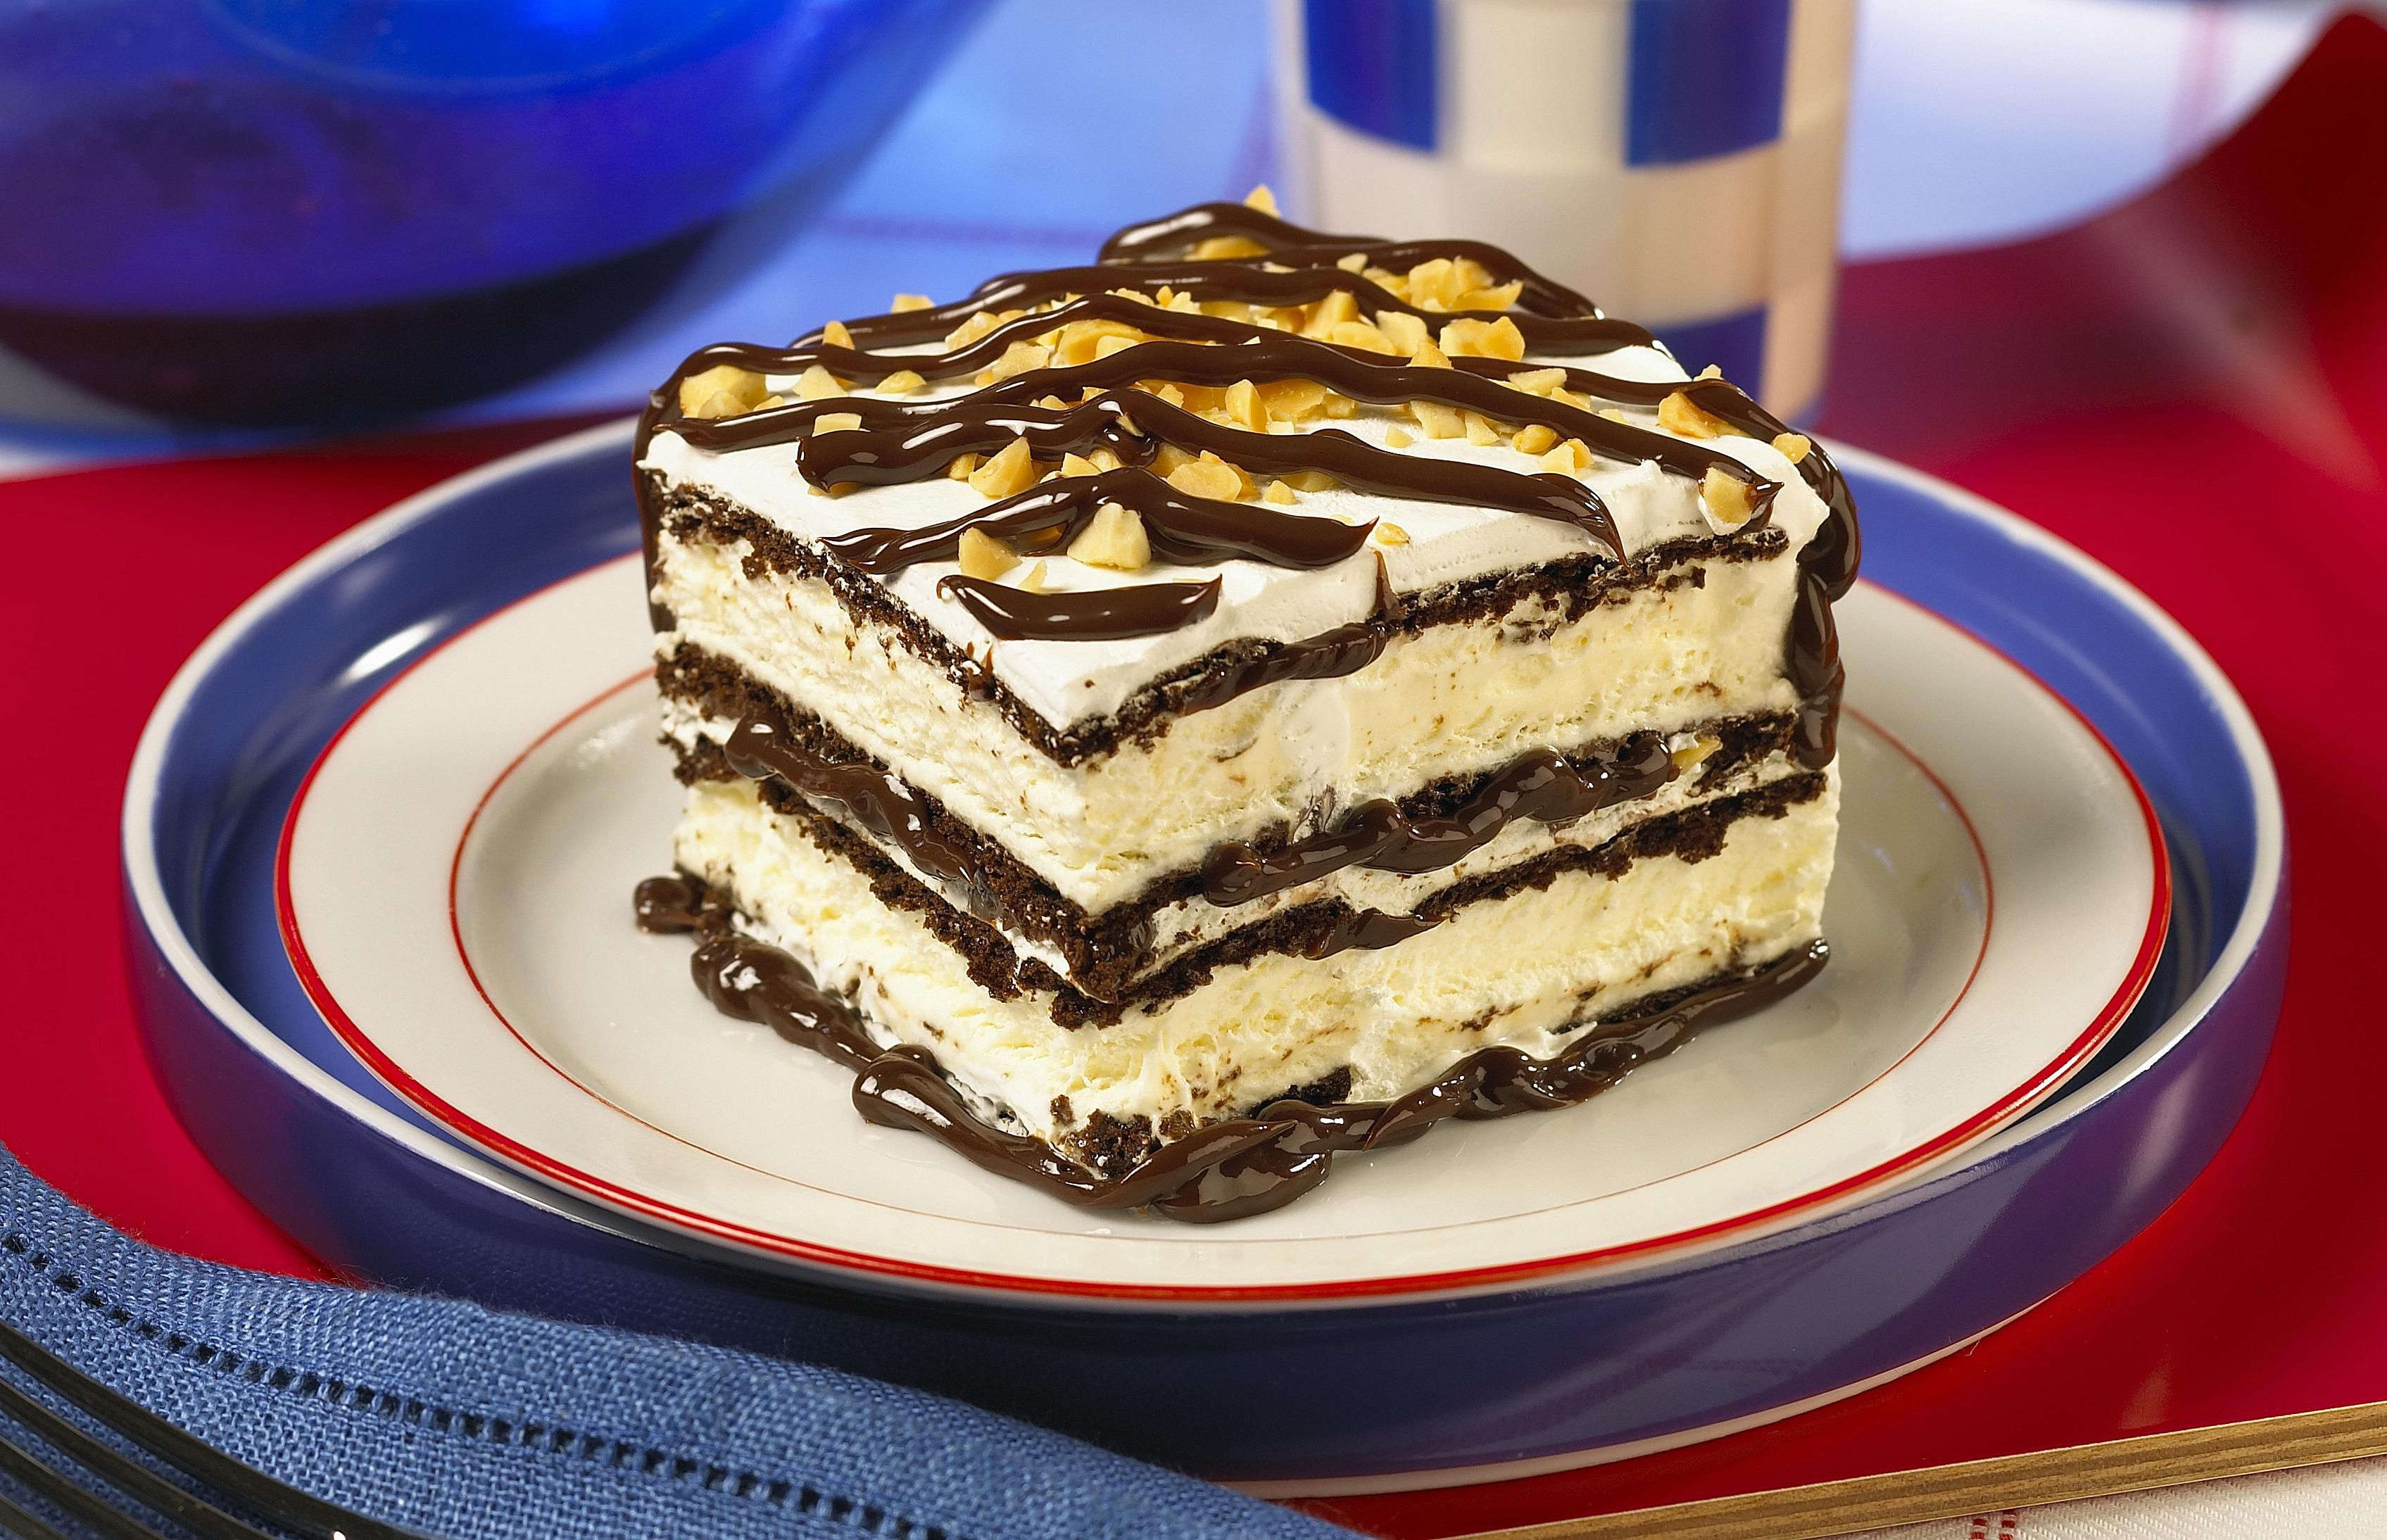 icecreamsandwichcake 58a47e305f9b58819c9fe947 jpg